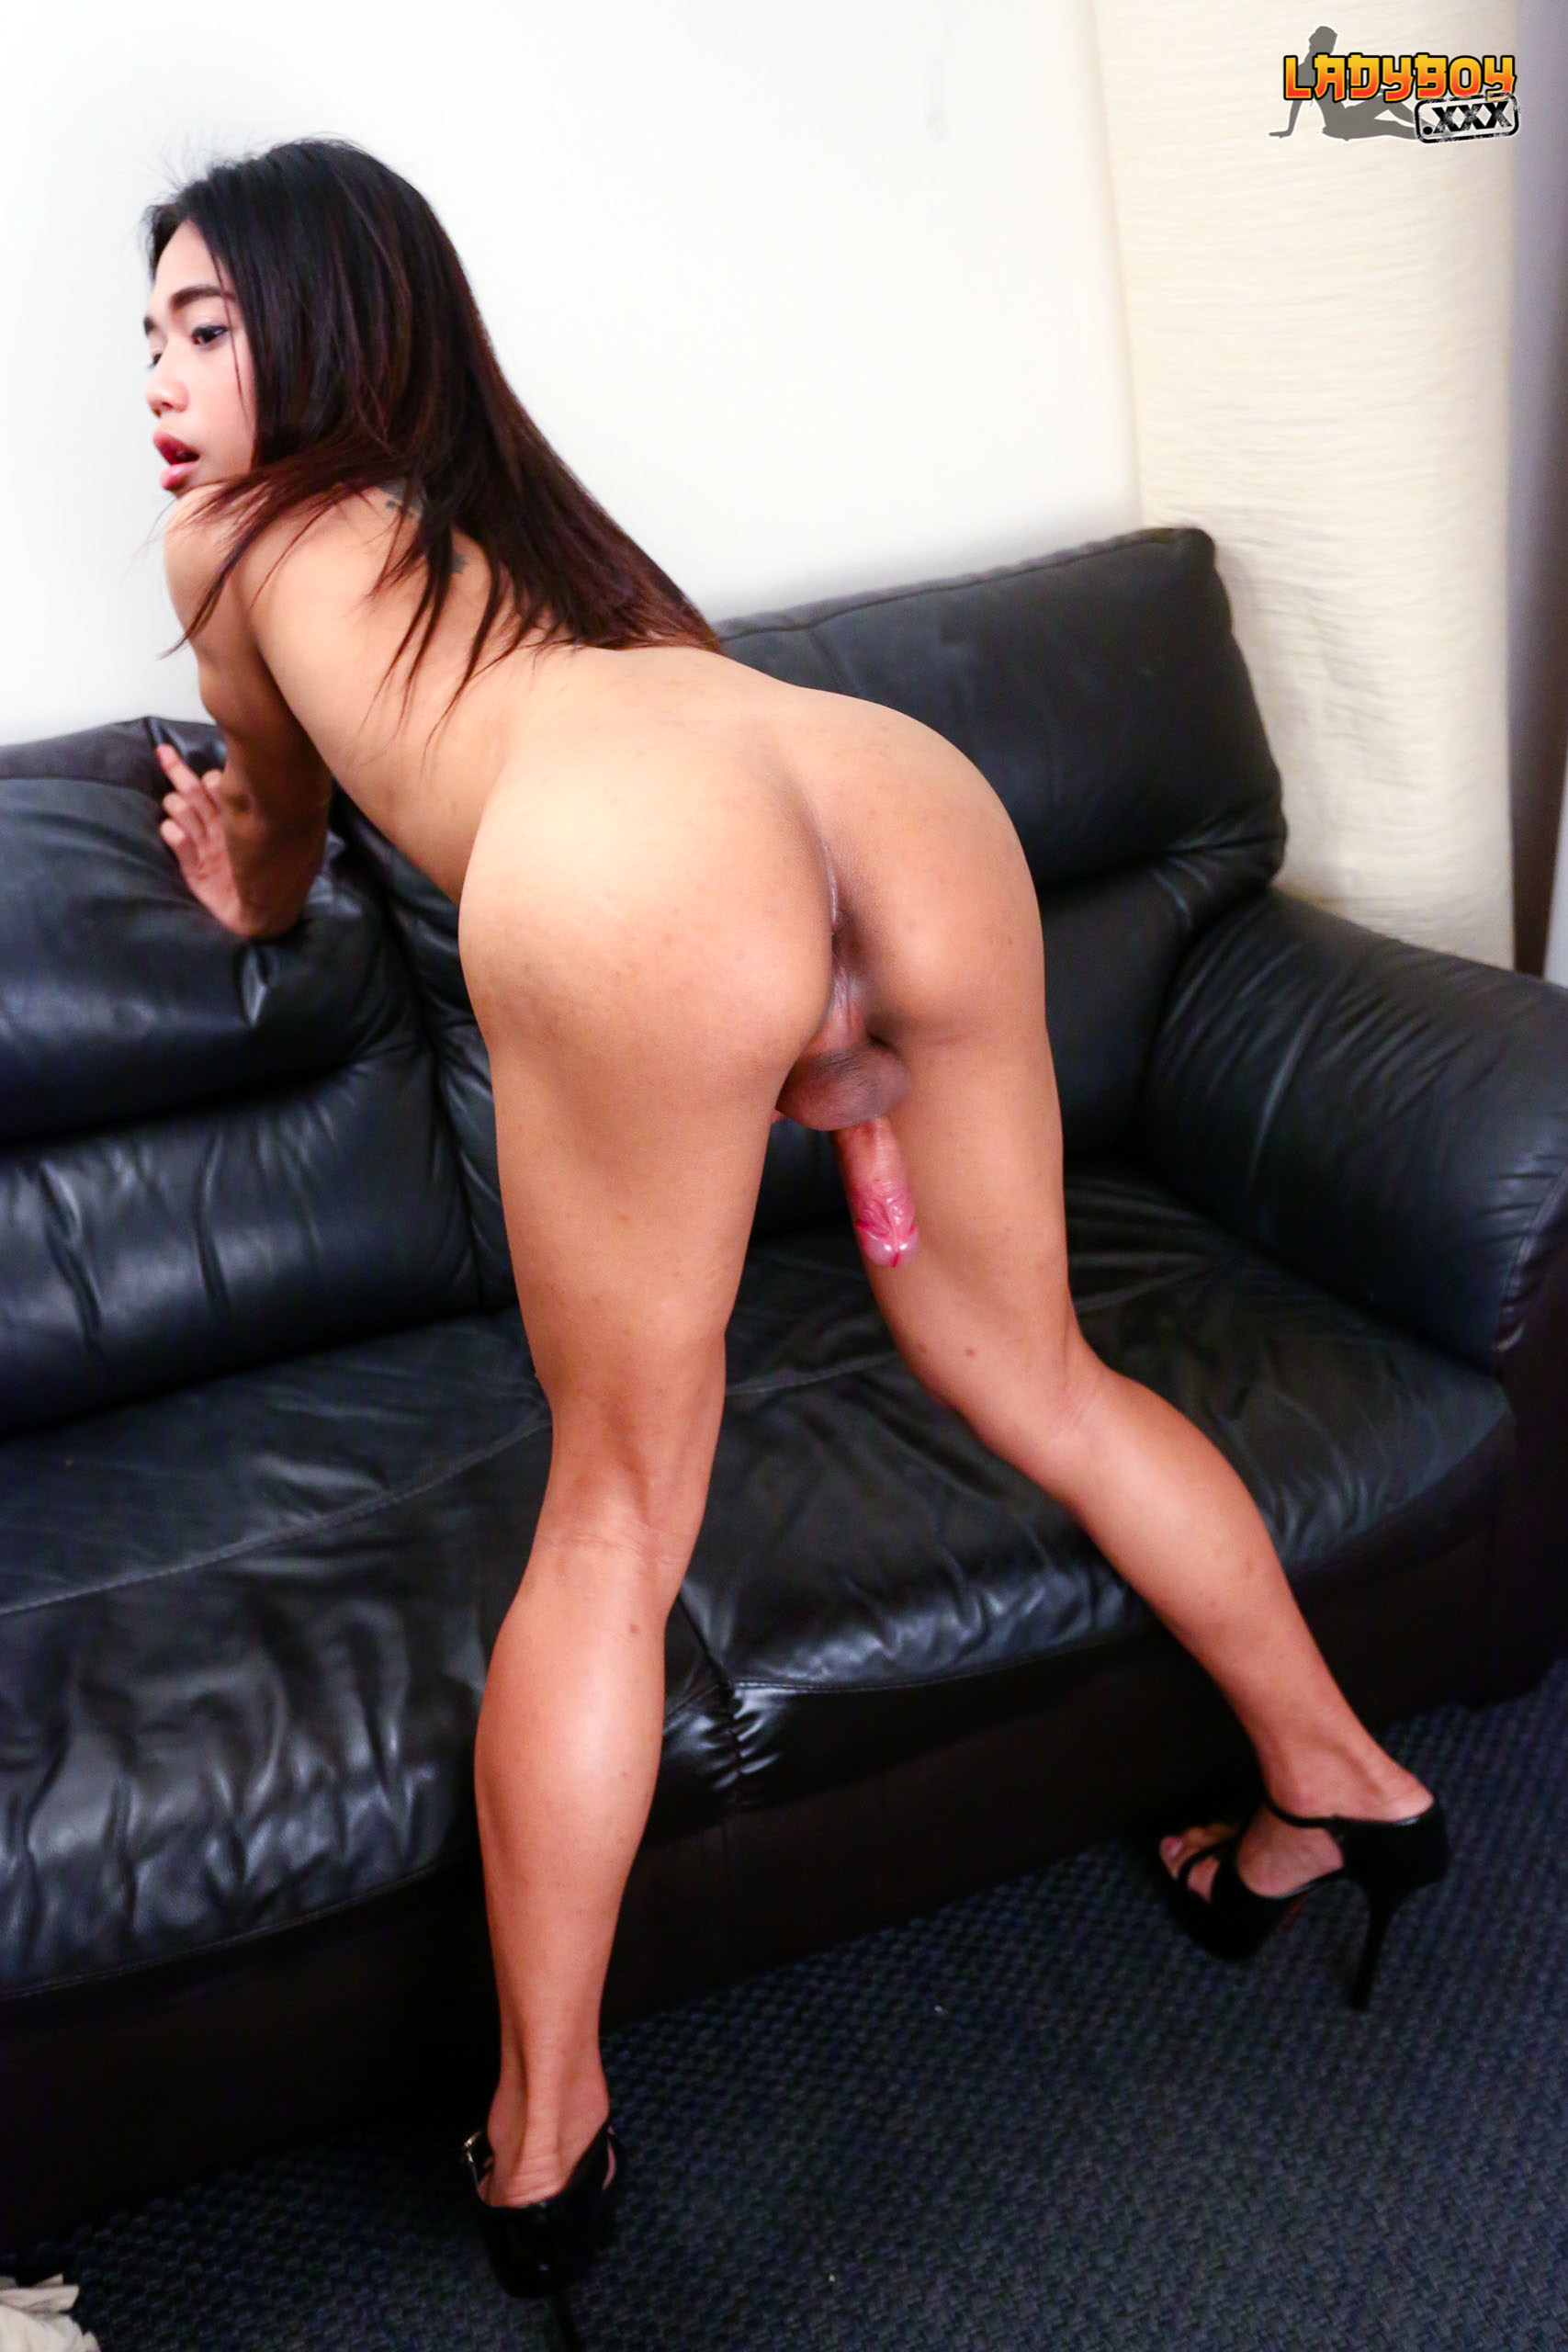 Voluptuous Pra With Sexy Cock!